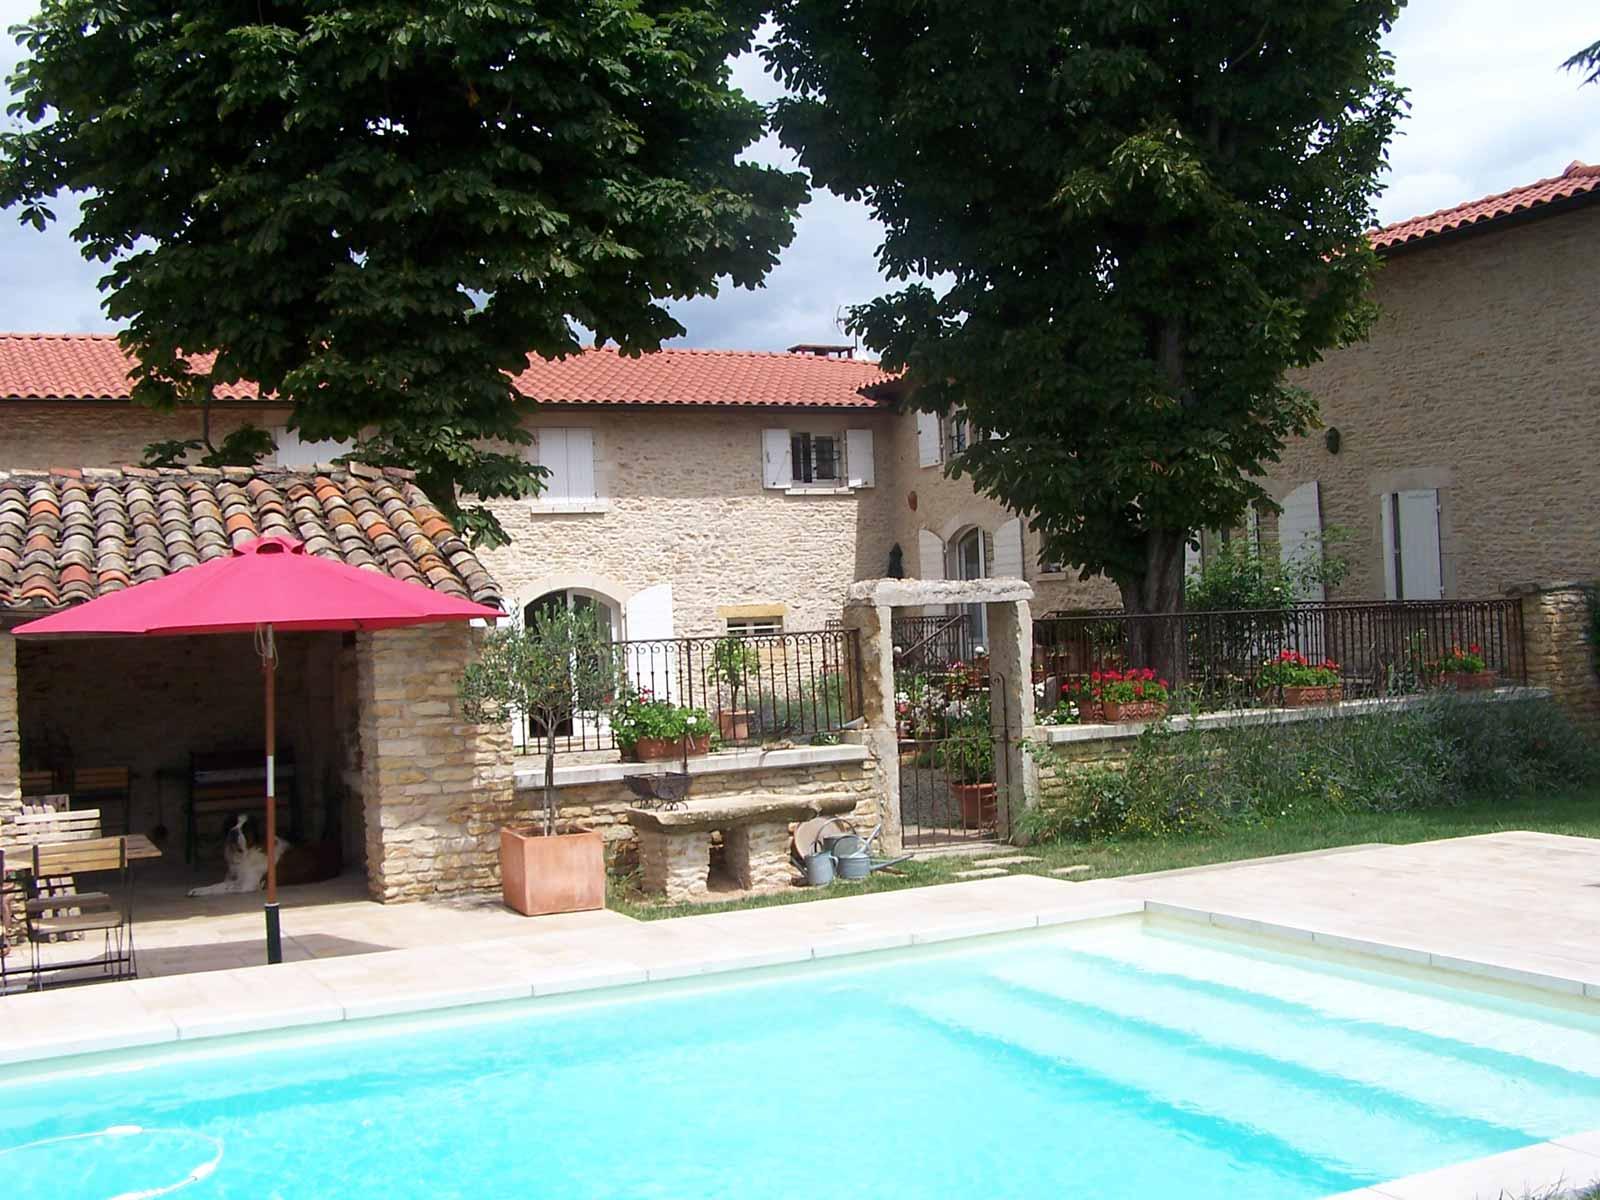 chambre-d-hote-piscine-beaujolais